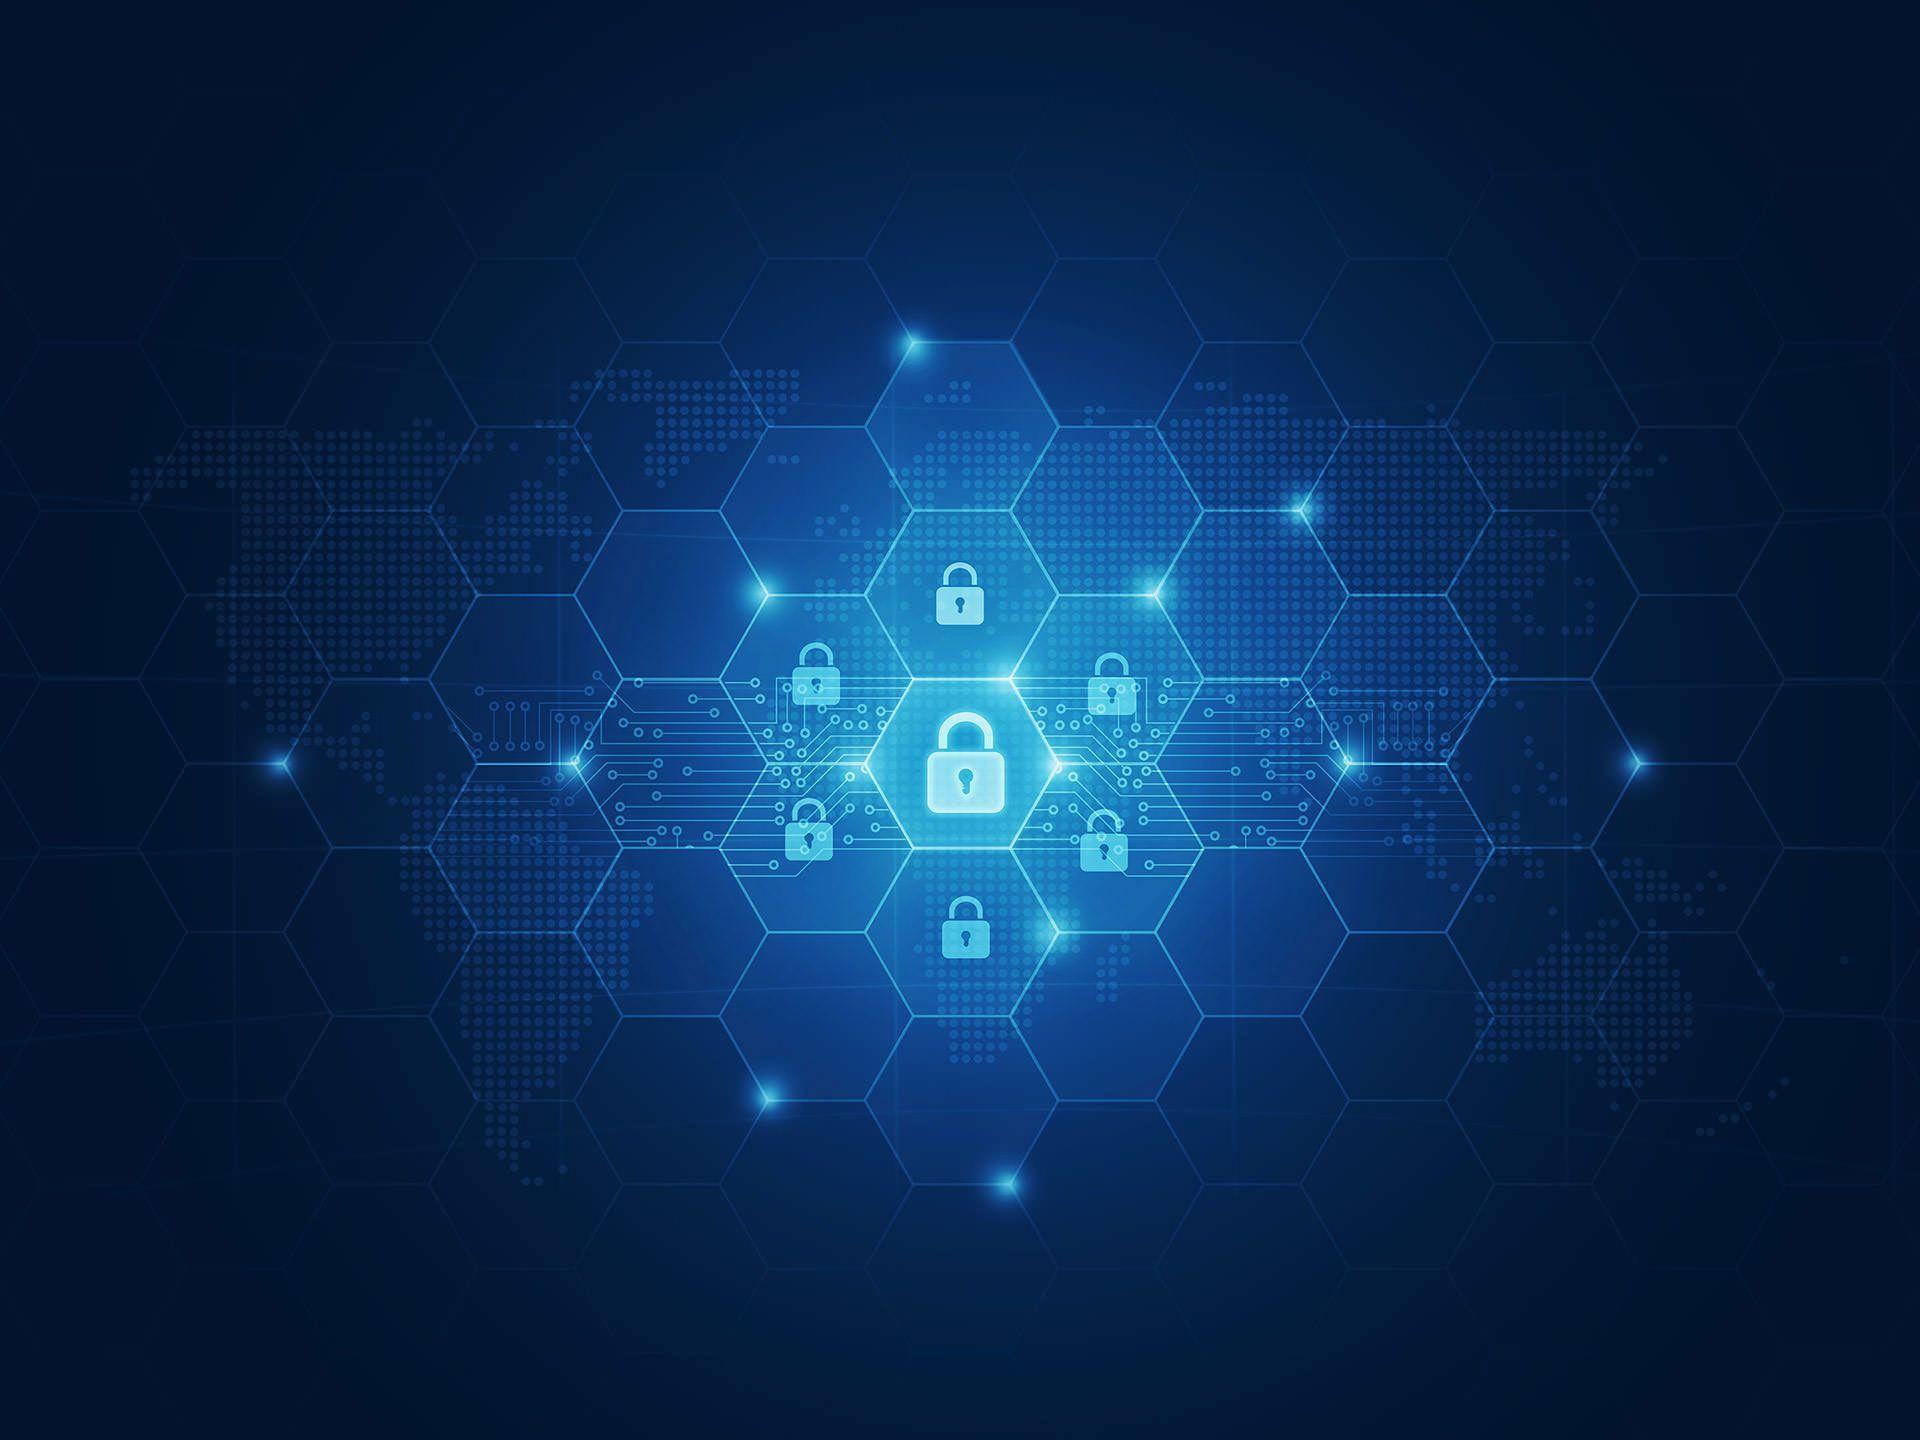 Cyber security wallpapers wallpaper cave - Surveillance wallpaper ...